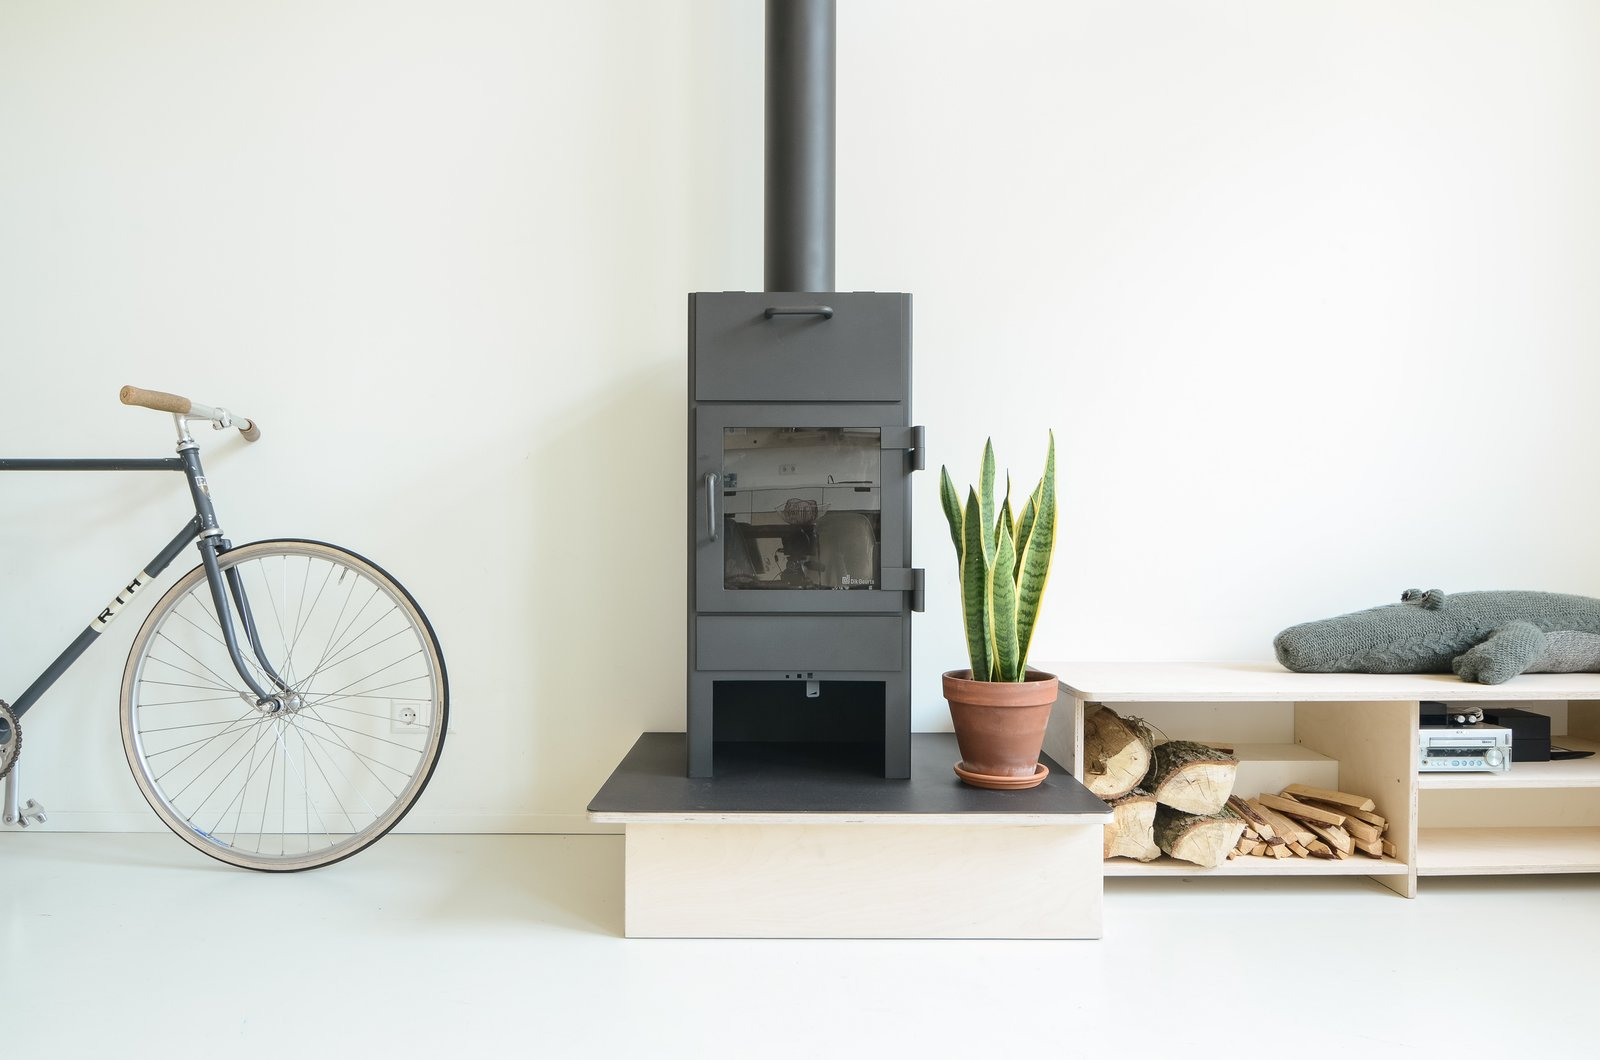 Photo courtesy of Standard Studio  97+ Modern Fireplace Ideas from Scandinavian Inspired Design